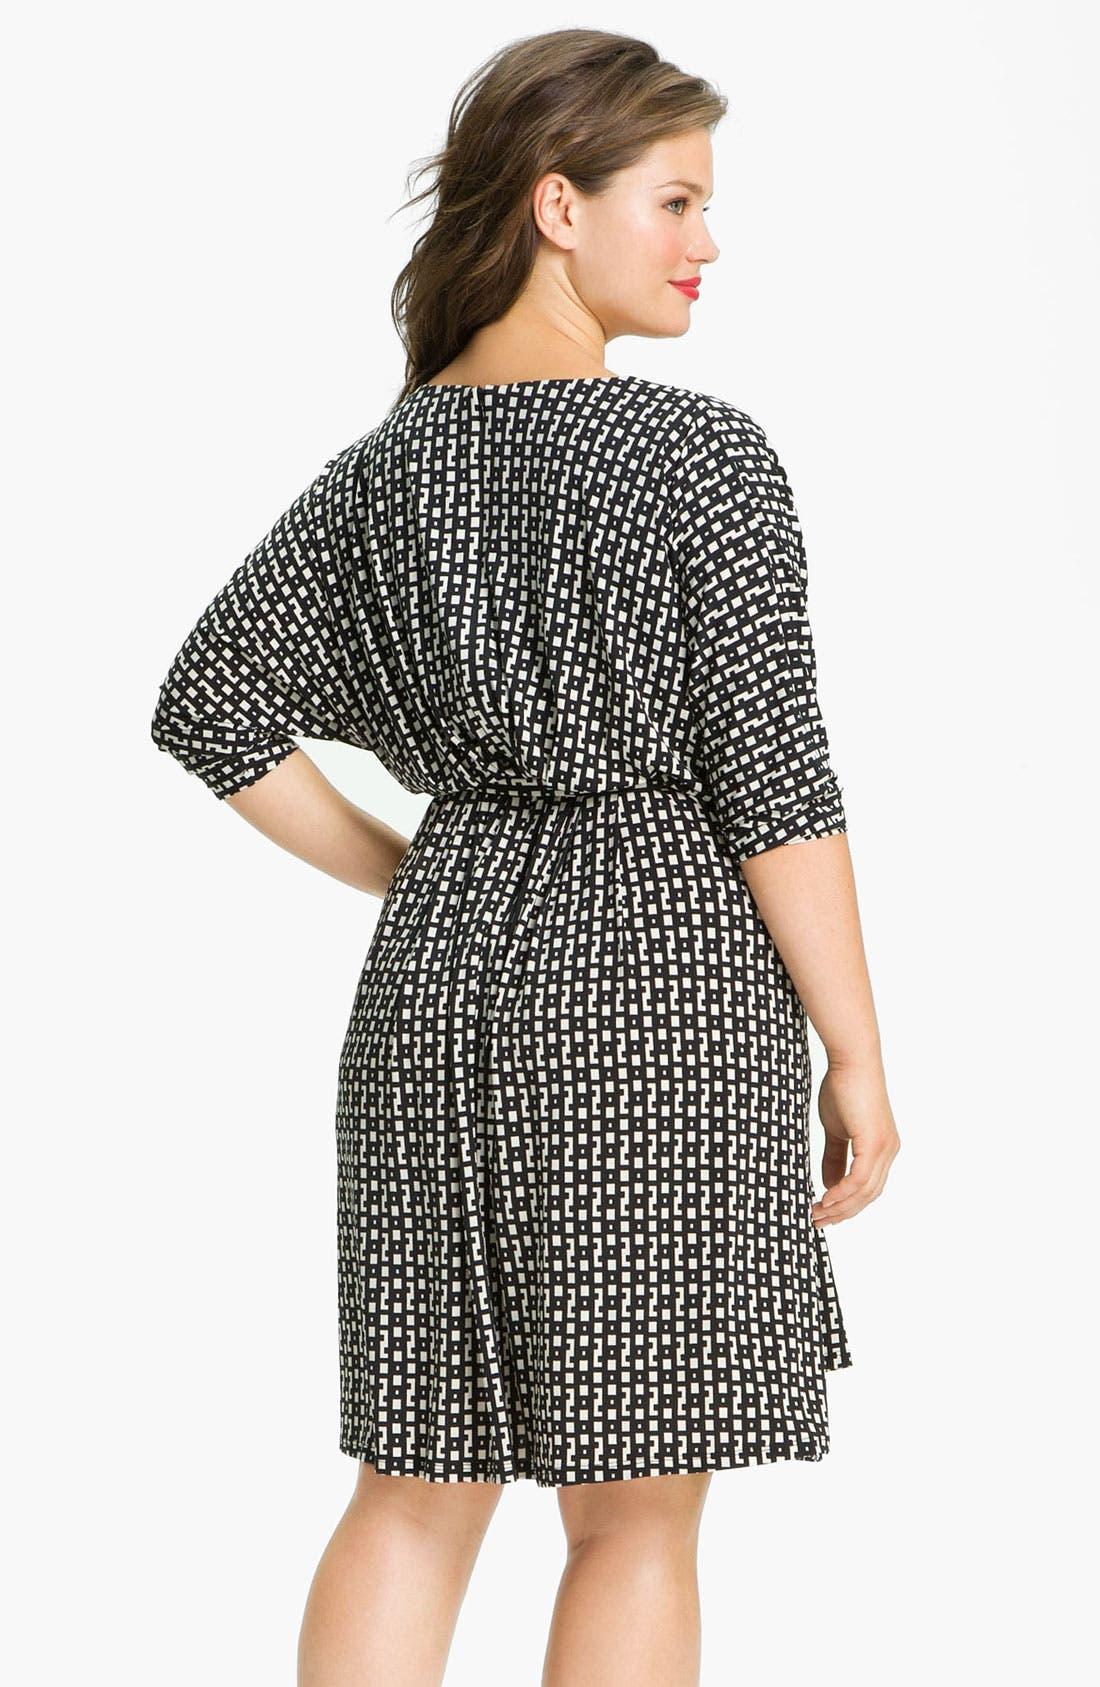 Alternate Image 2  - Suzi Chin for Maggy Boutique Dolman Sleeve V-Neck Dress (Plus)